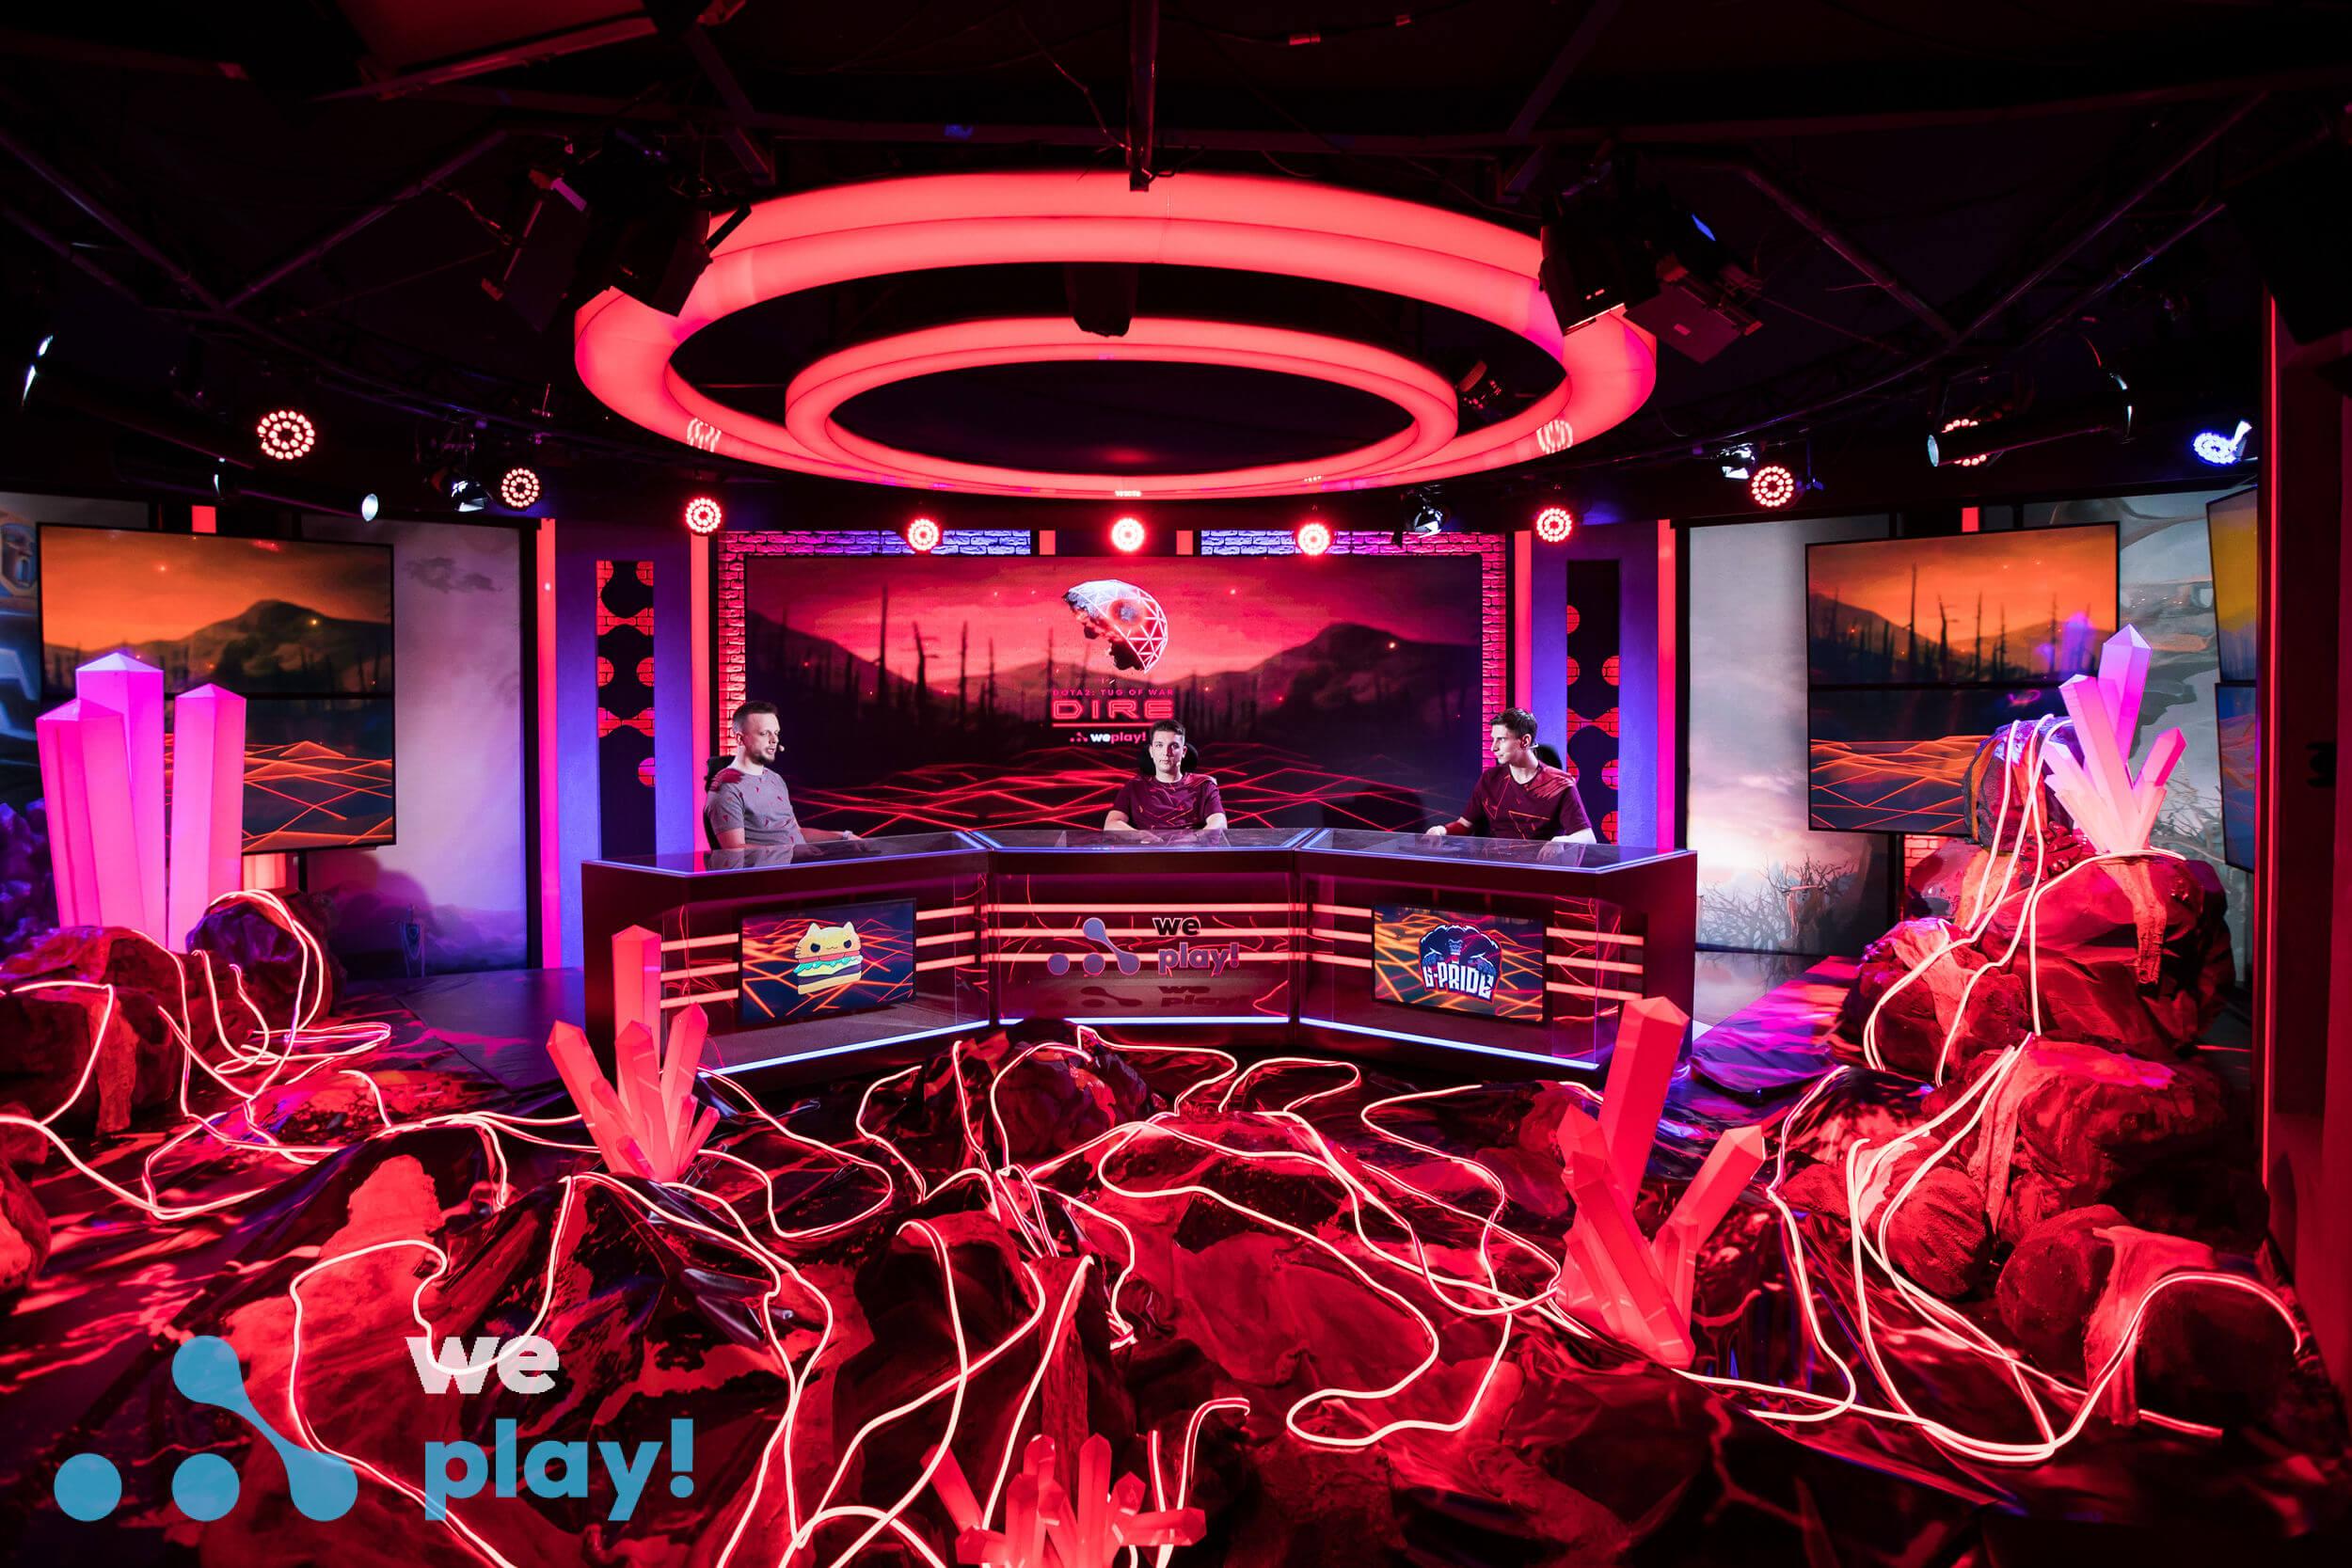 WePlay! Dota 2 Tug of War: Dire studio